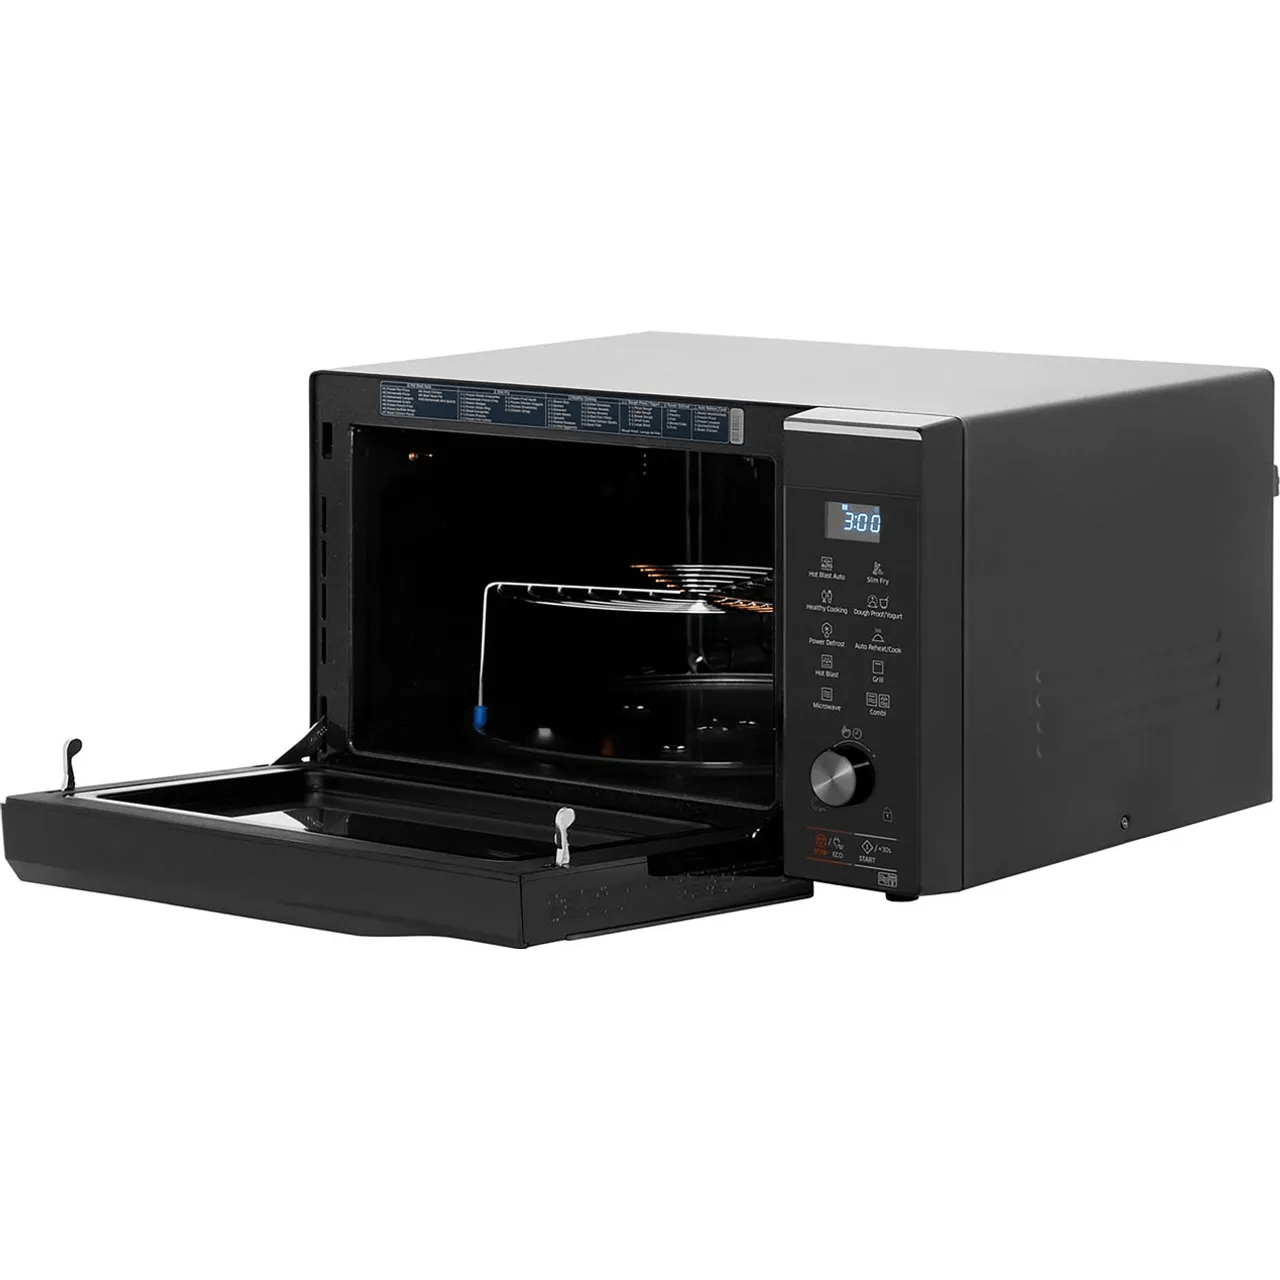 samsung hotblast mc32k7055ck 32 litre combination microwave oven black